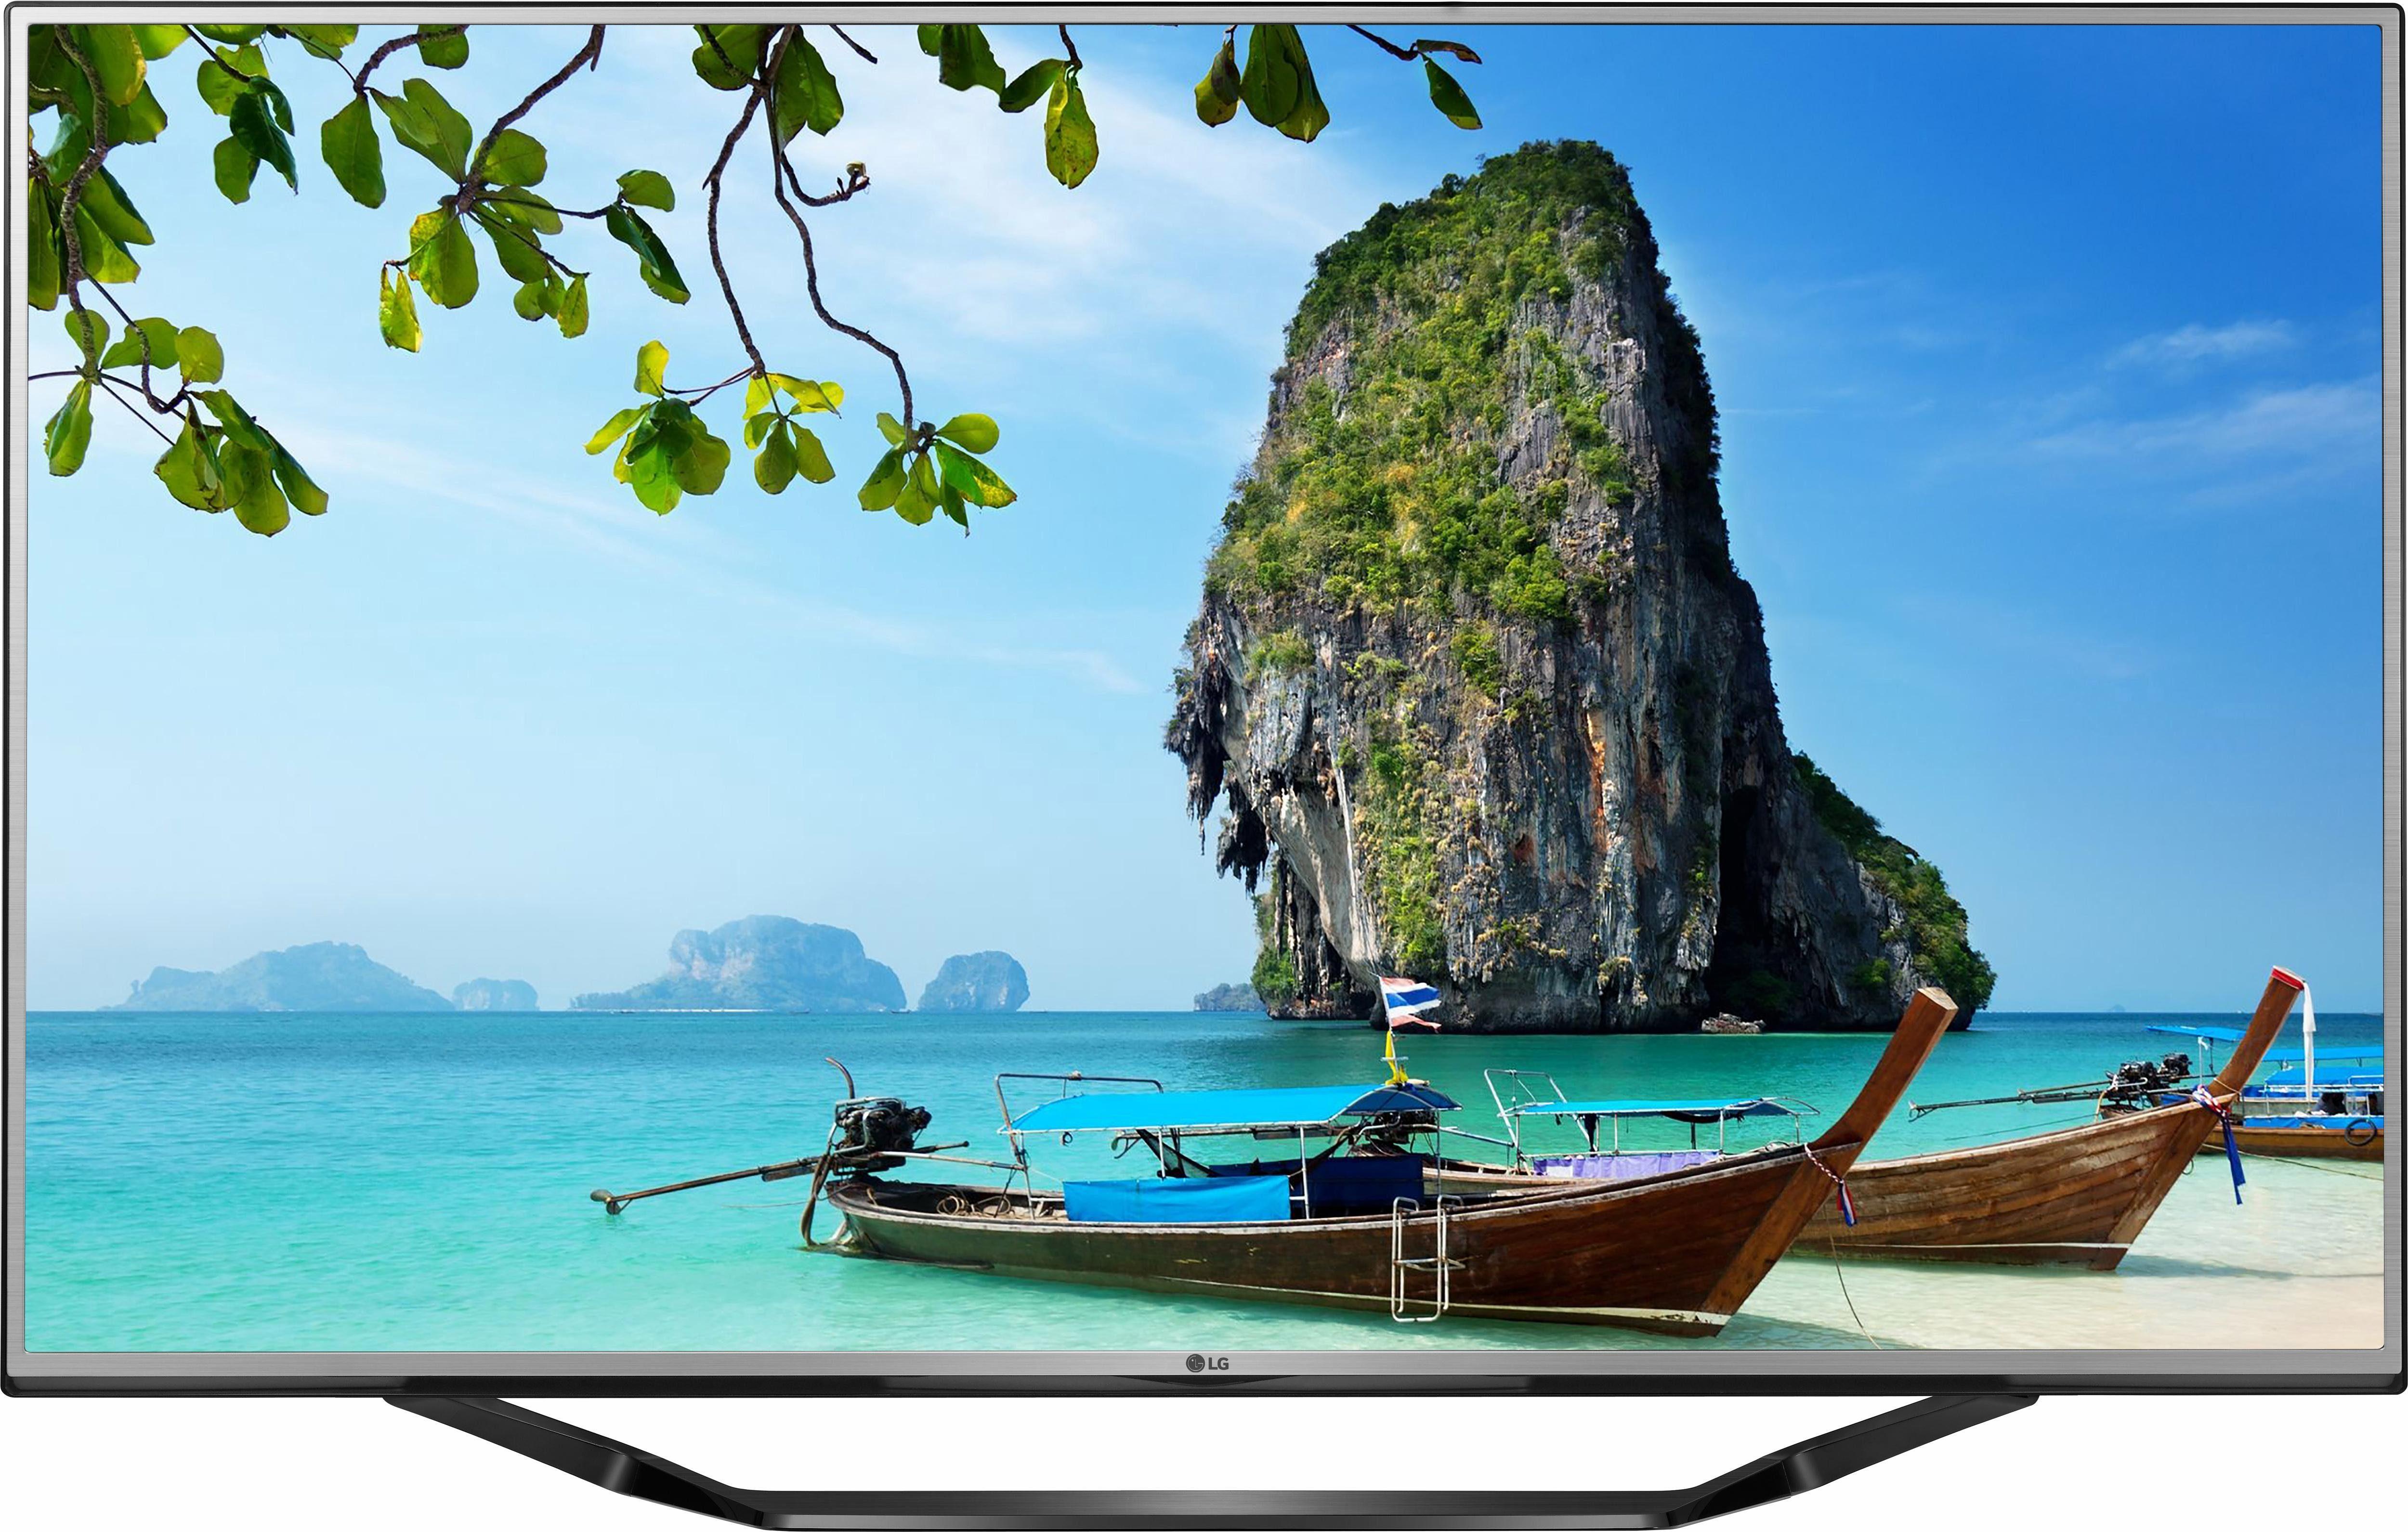 LG 55UH625V, LED Fernseher, 139 cm (55 Zoll), 2160p (4K Ultra HD), Smart-TV